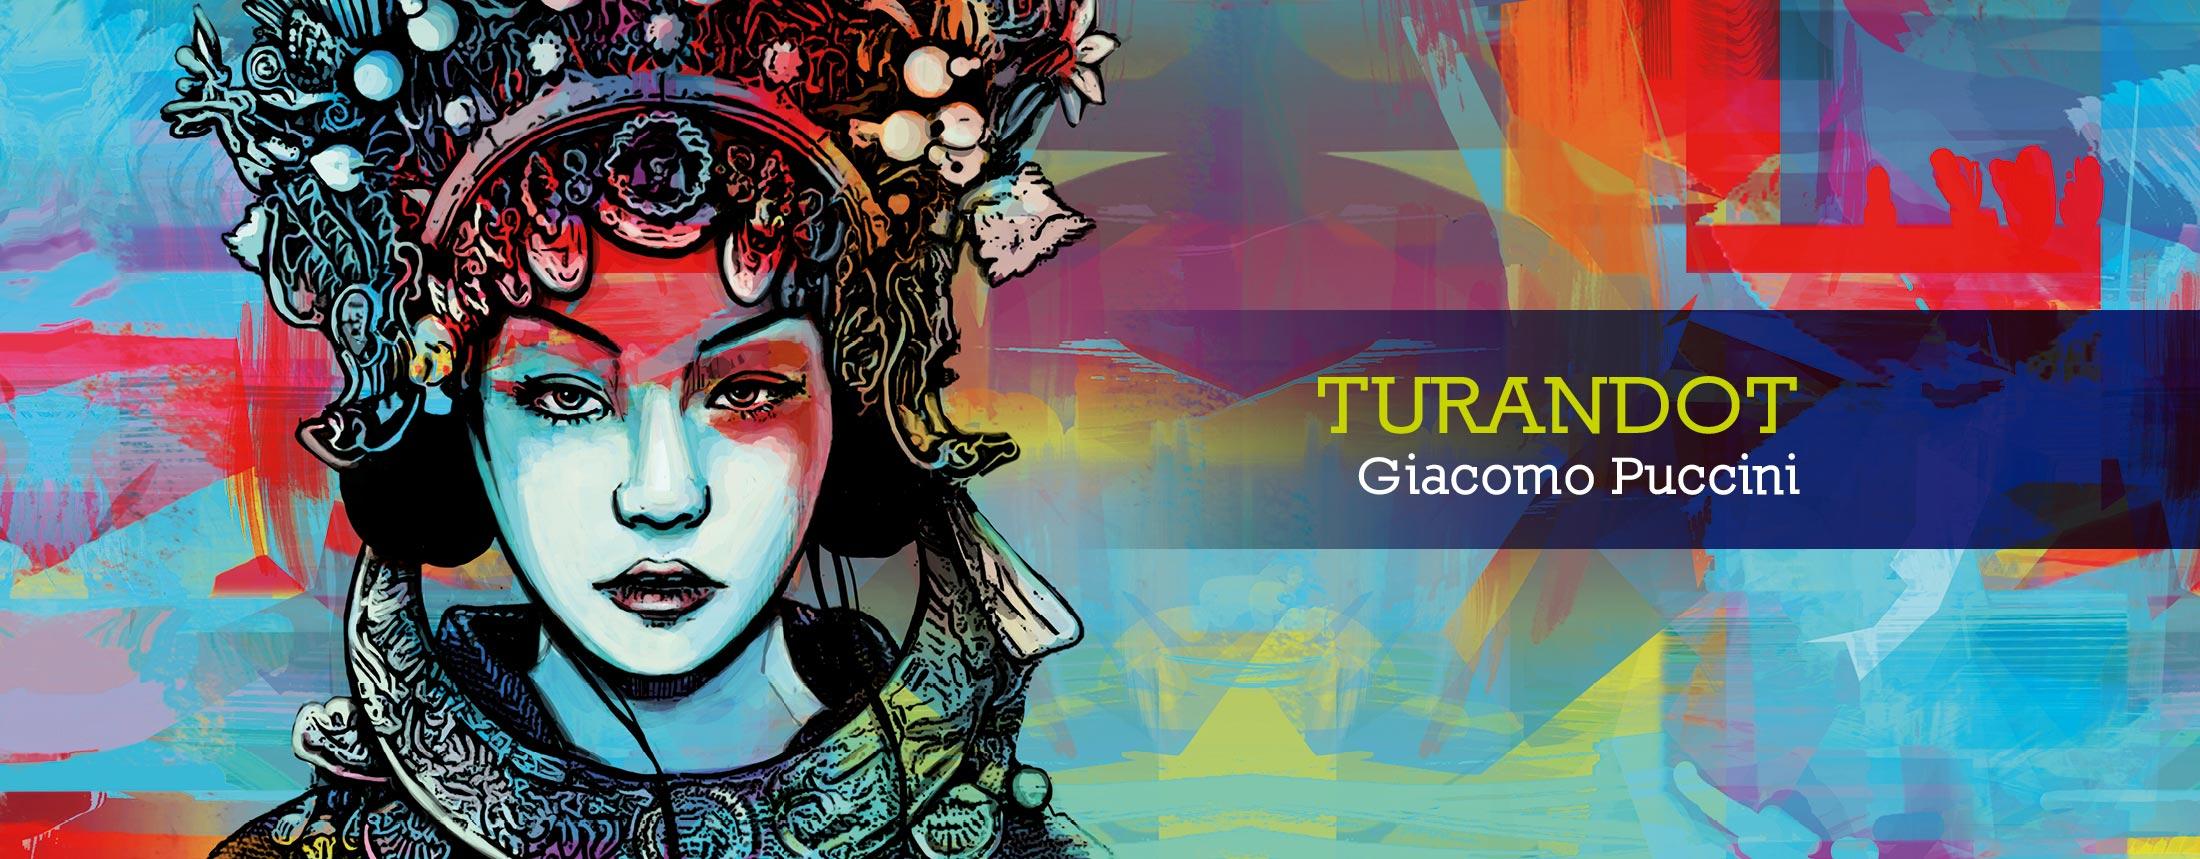 TCBO_2200x859-Turandot_0918